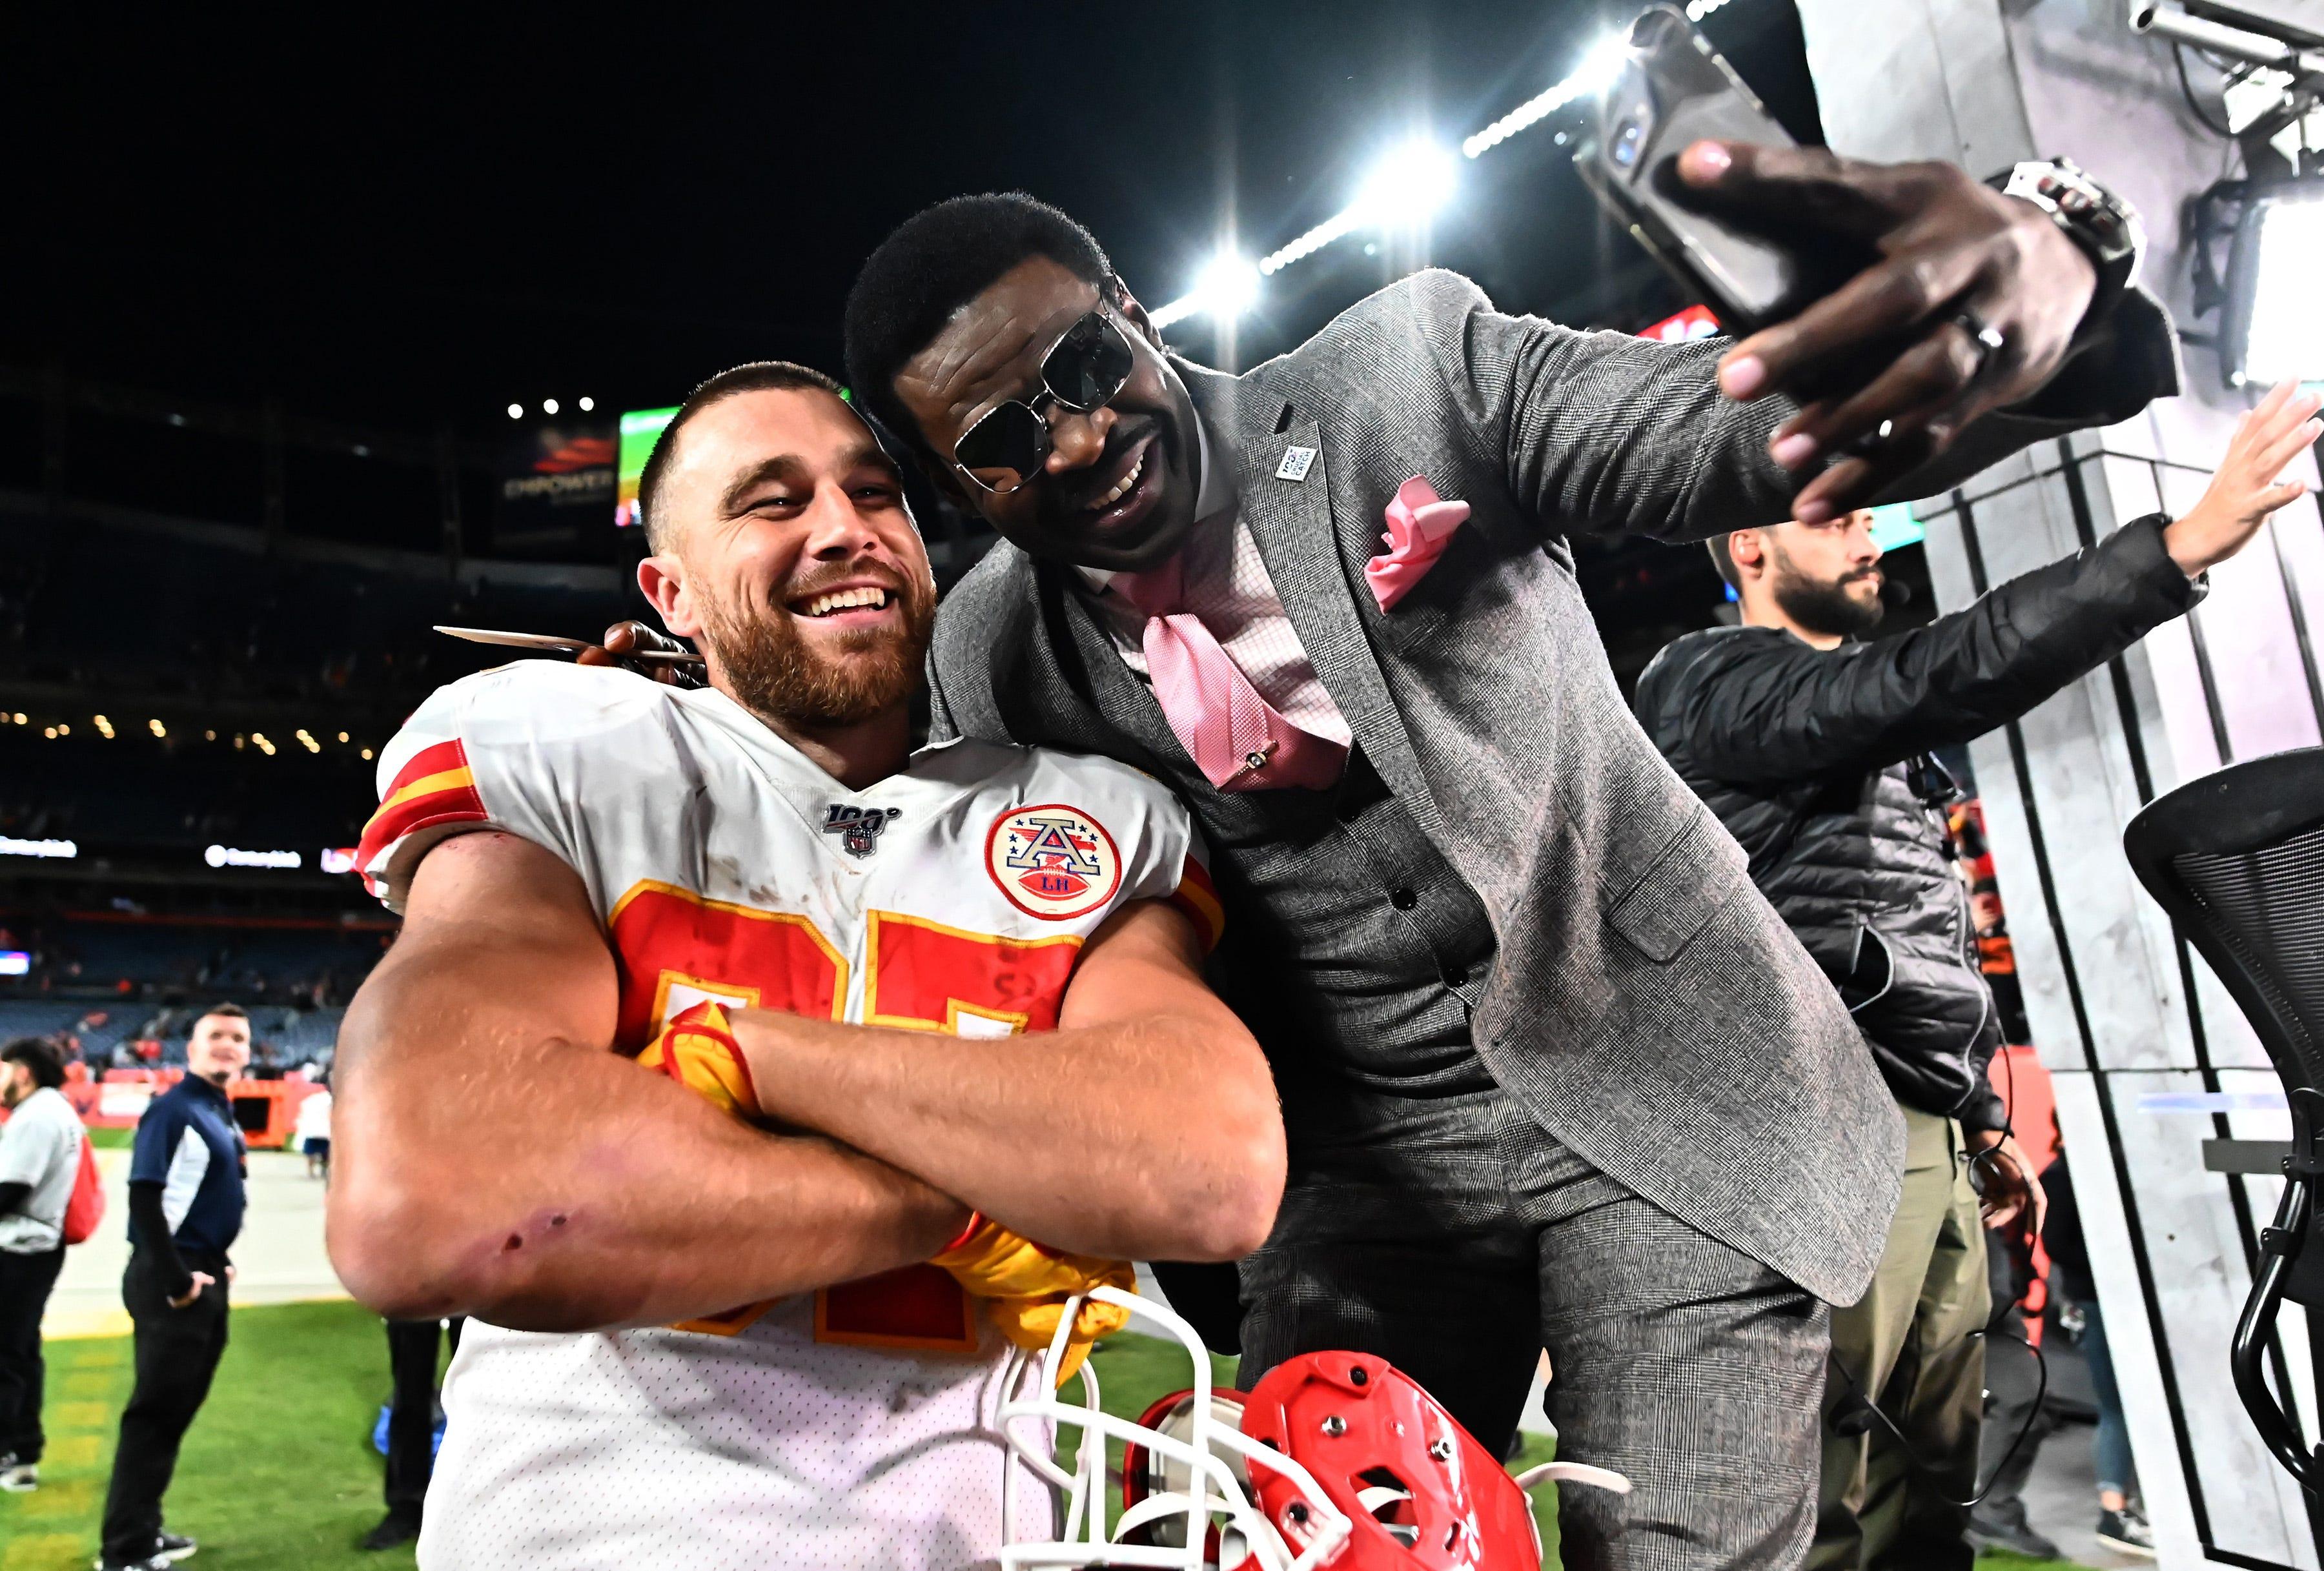 NFL Week 7 s best photos